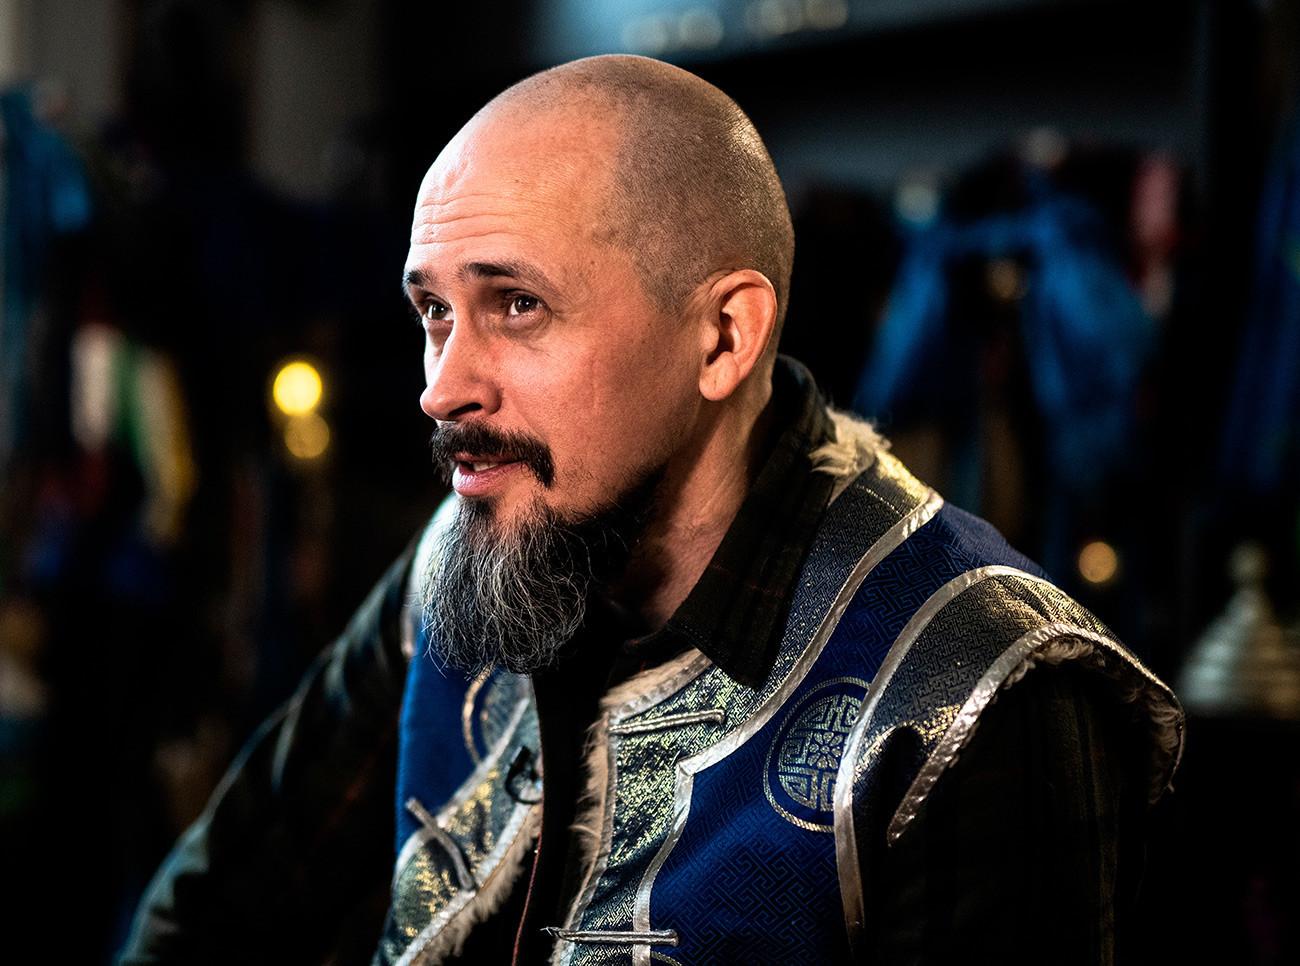 Čeljabinski šaman, pjevač, glazbenik, izvođač različitih stilova pjevanja i stručnjak za preživljavanje Tjurgen Kam.